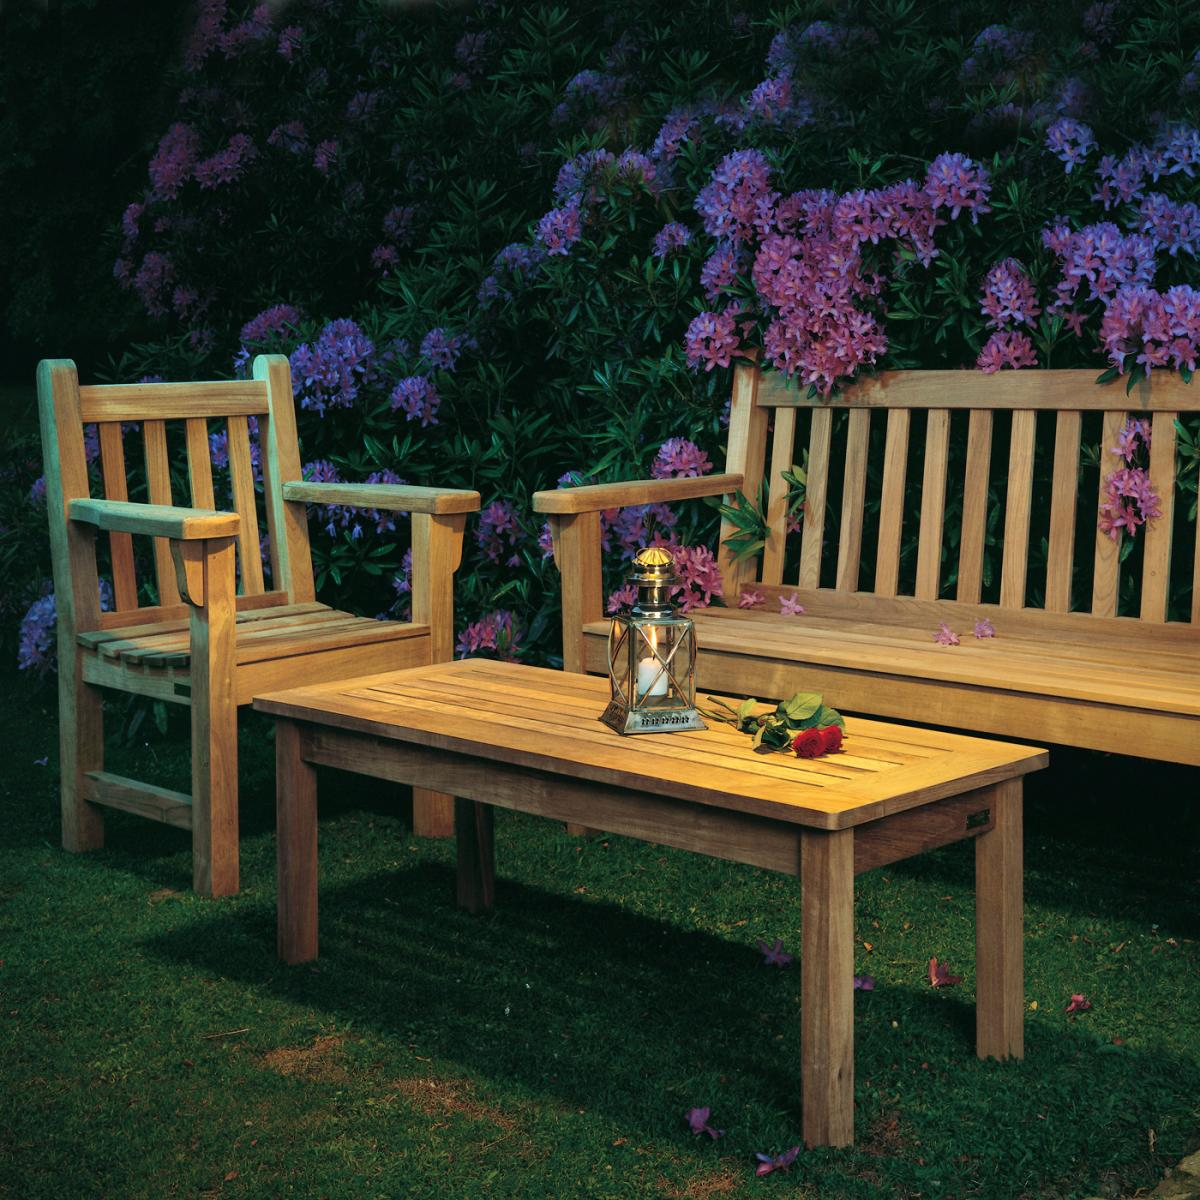 garden furniture  clifton nurseries - clifton nurseries barlow tyrie london traditional teak garden bench set